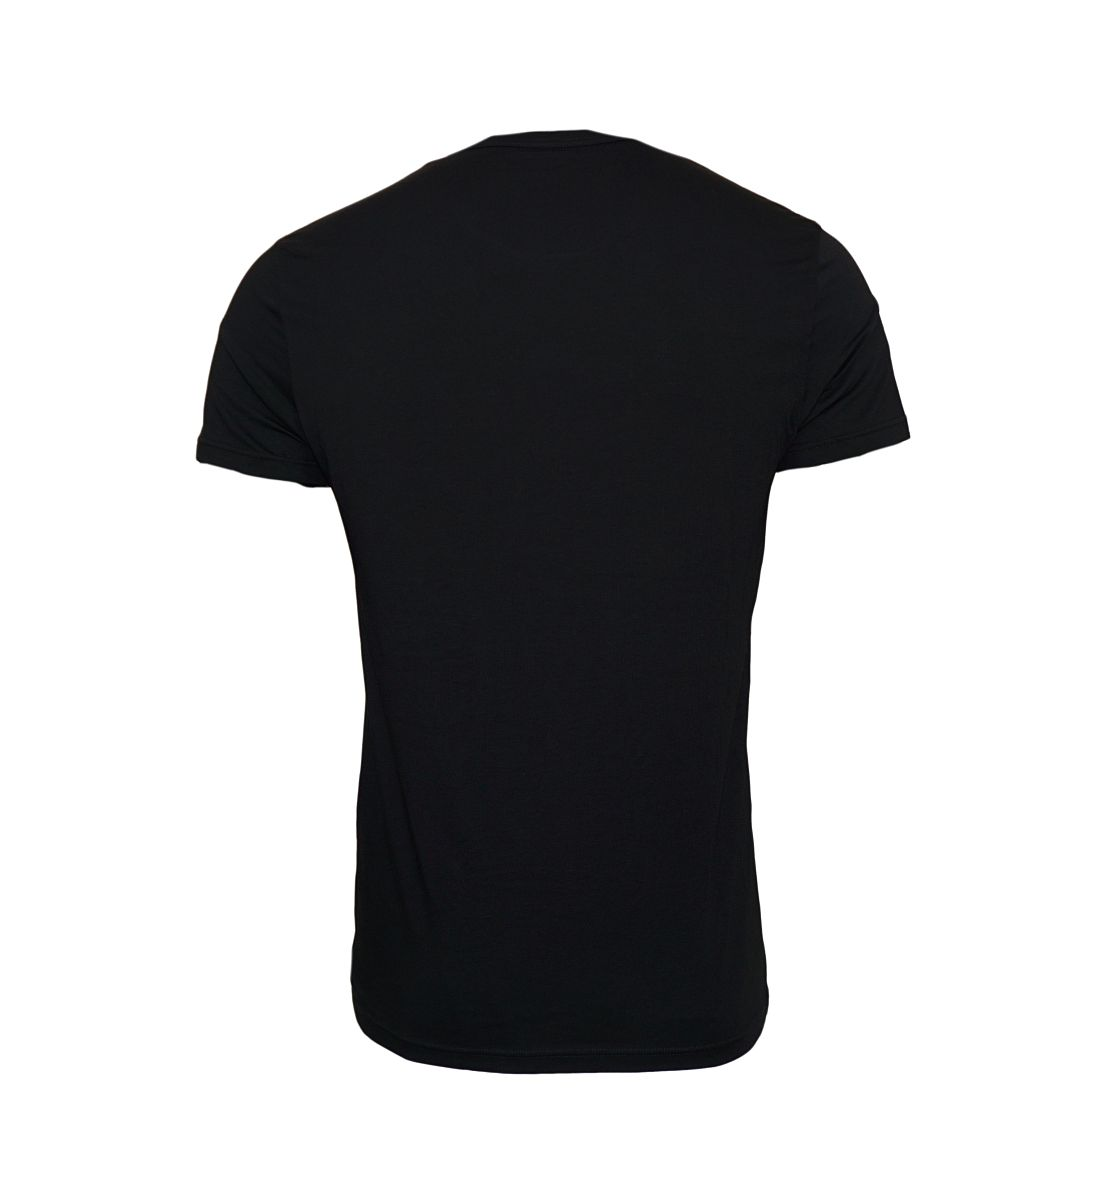 Emporio Armani 2er Pack T-Shirts Rundhals 111267 8P717 54420 NERO/ULTRAMARINE W18-EATS1